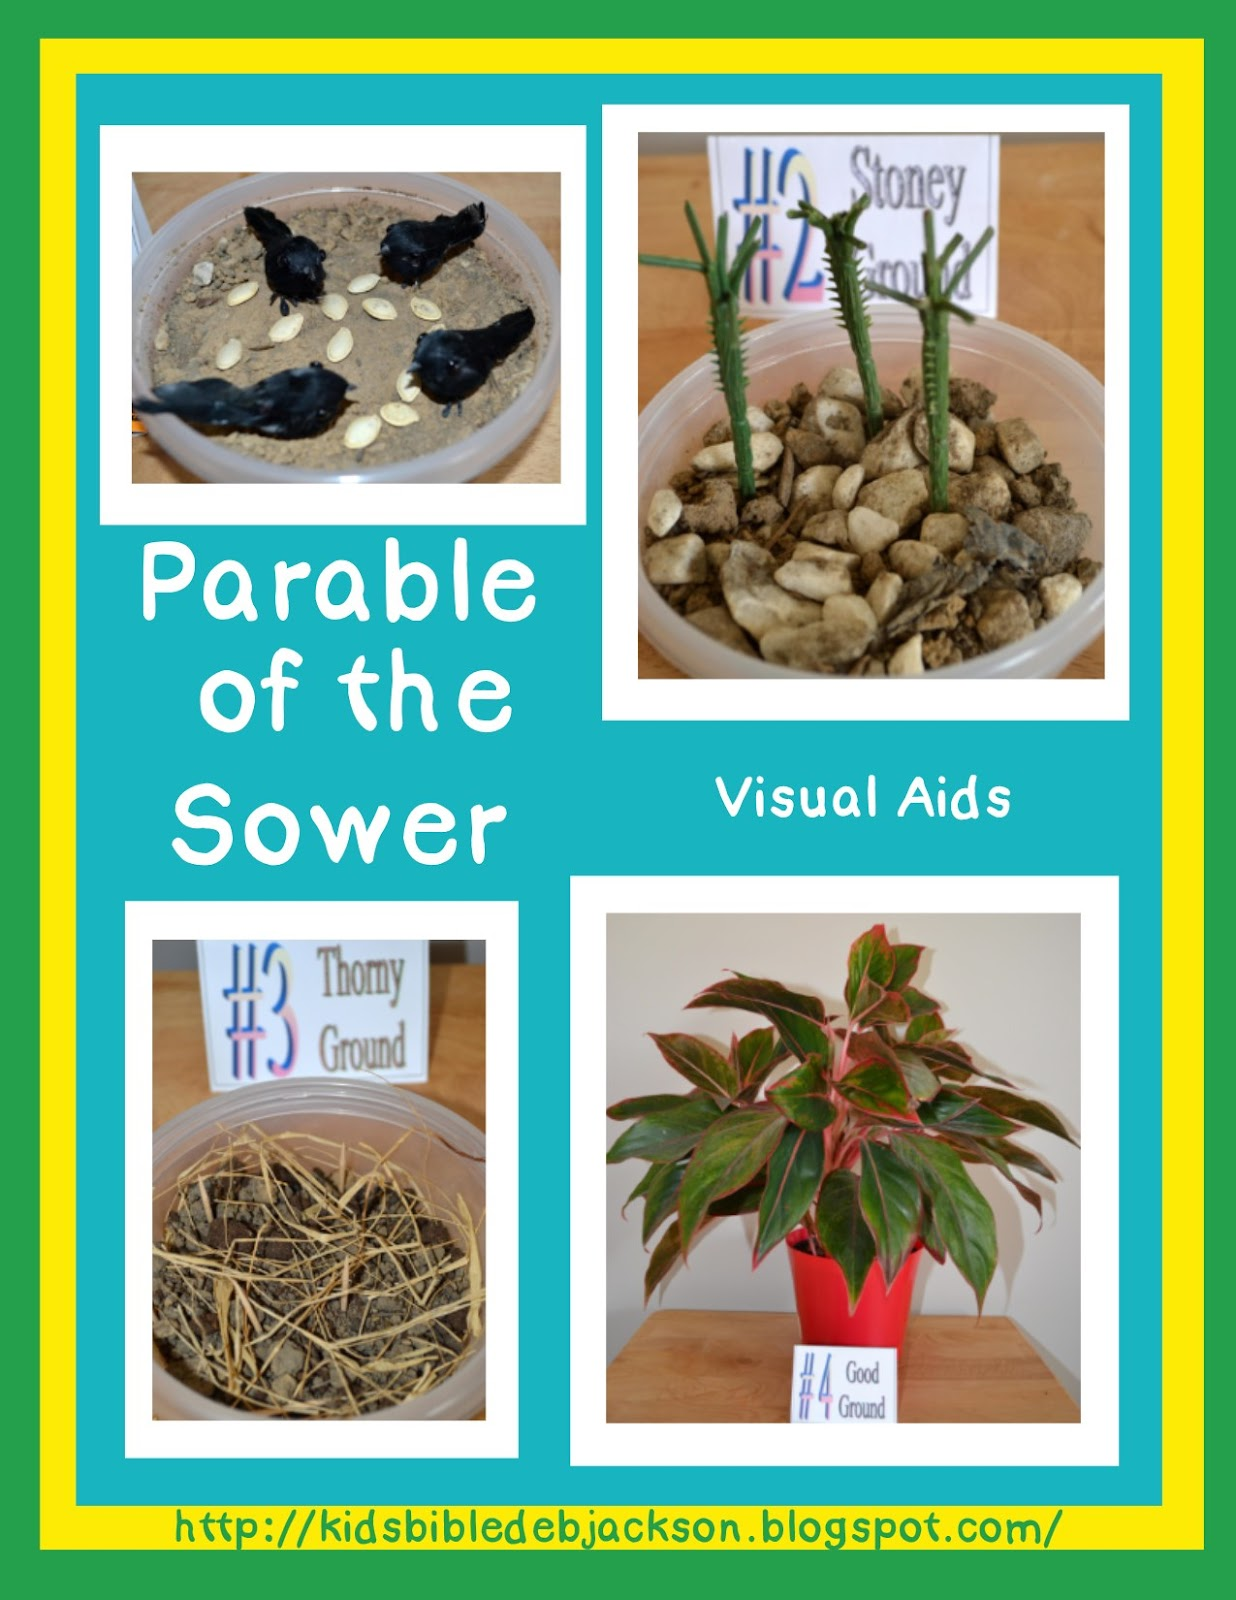 http://kidsbibledebjackson.blogspot.com/2014/09/parable-of-sower.html